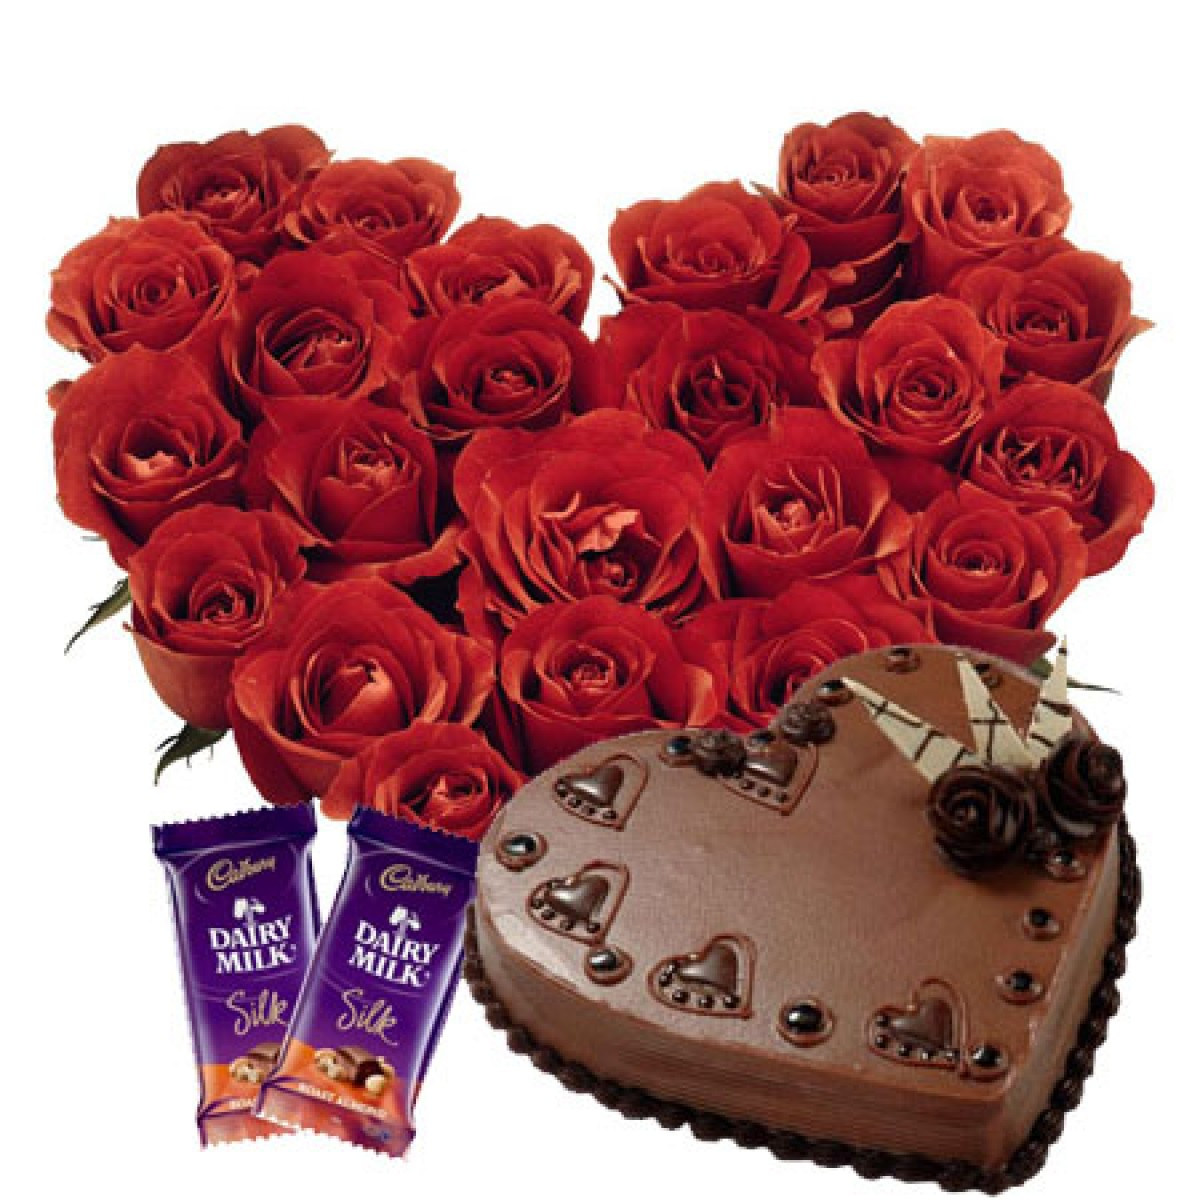 Send Online Valentine Day Gift For Him In Vizag Visakhapatnam